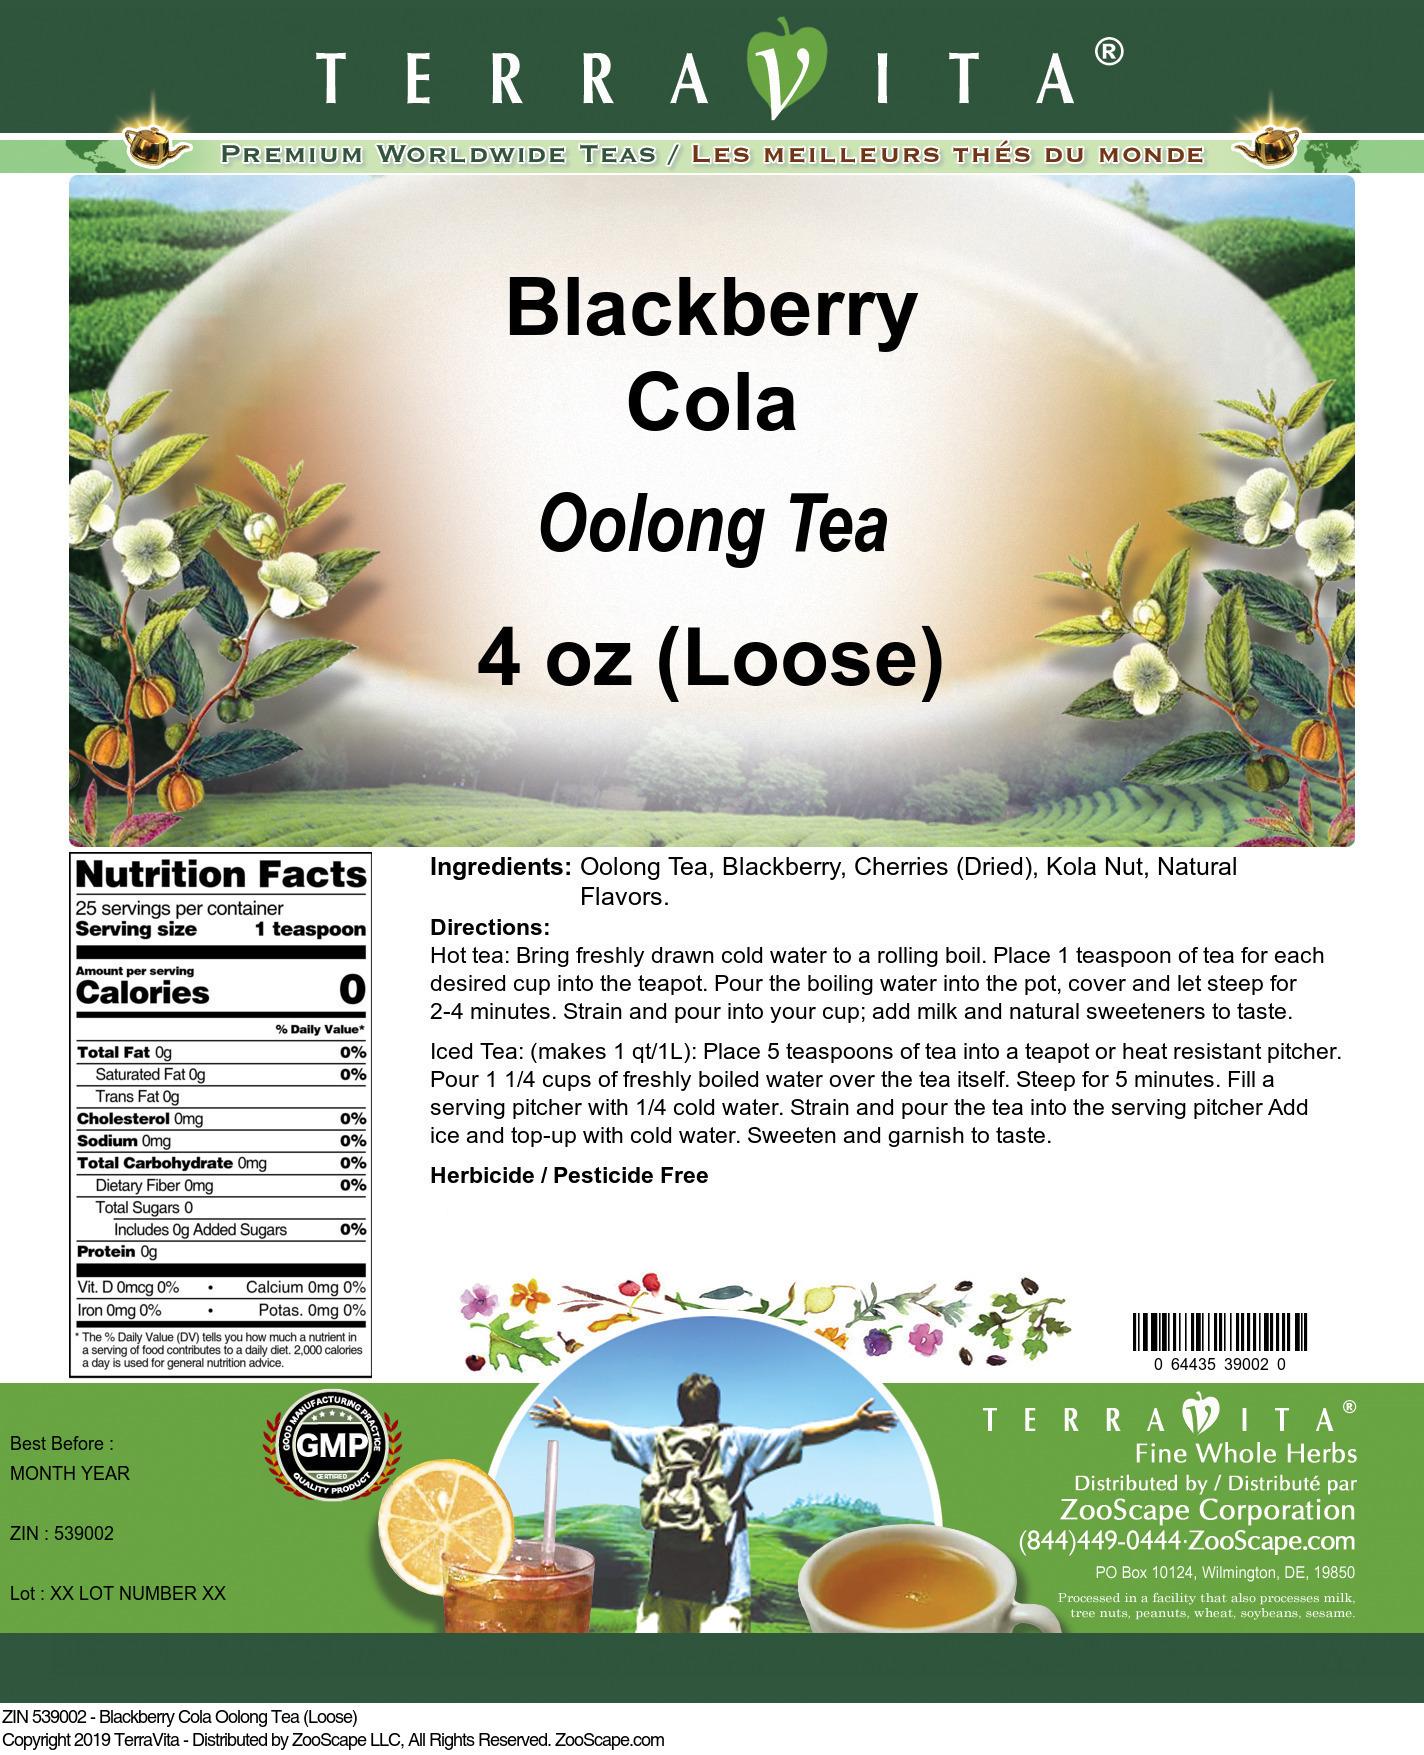 Blackberry Cola Oolong Tea